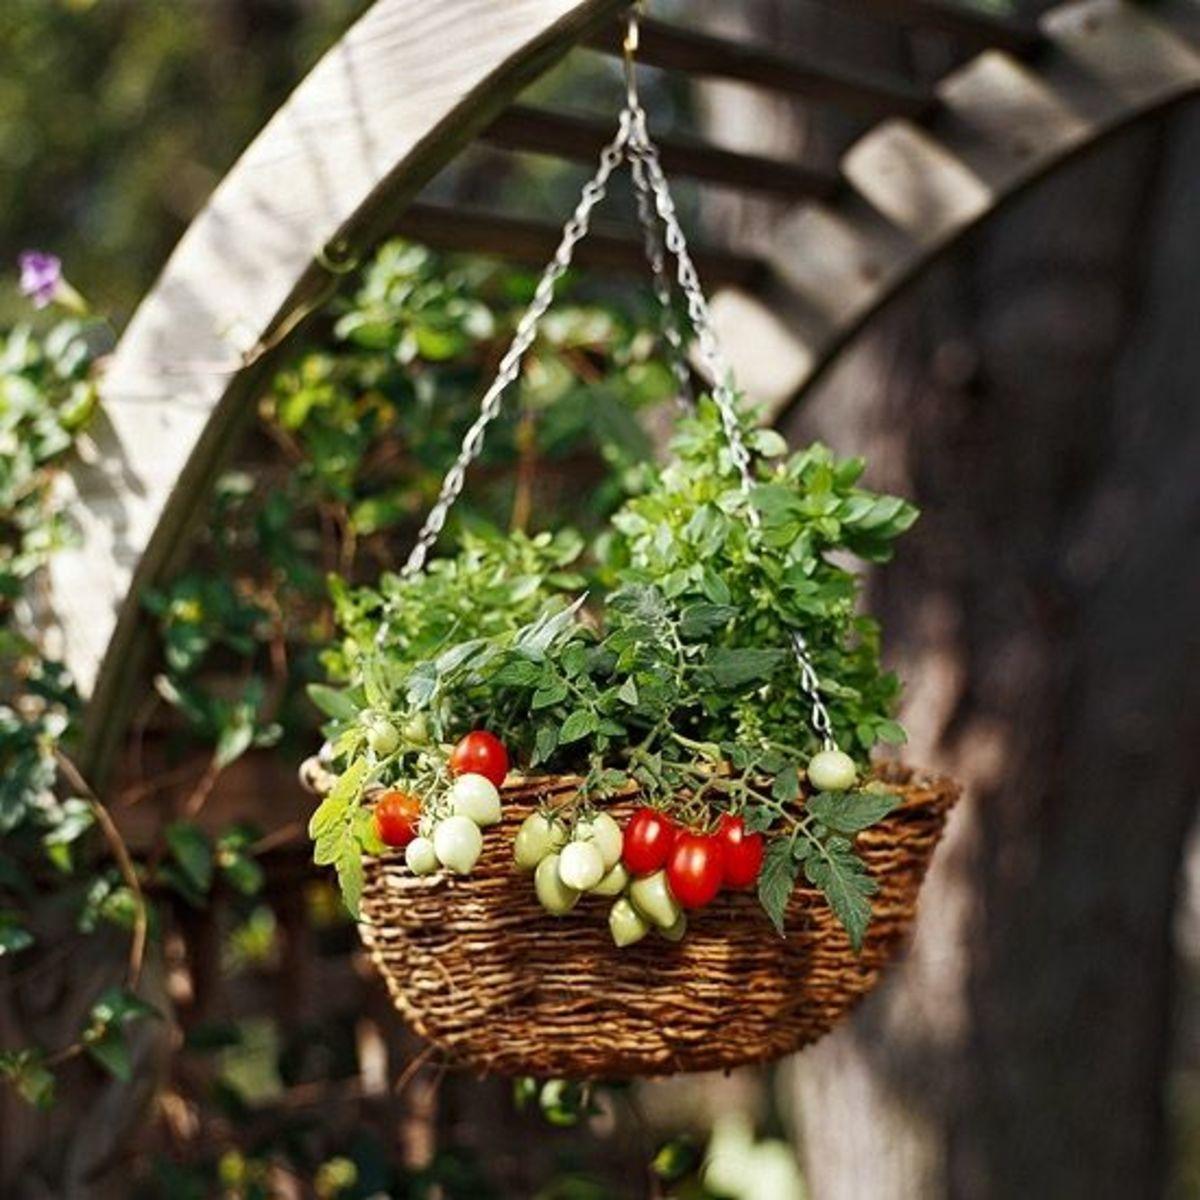 Growing a grape tomato basket.